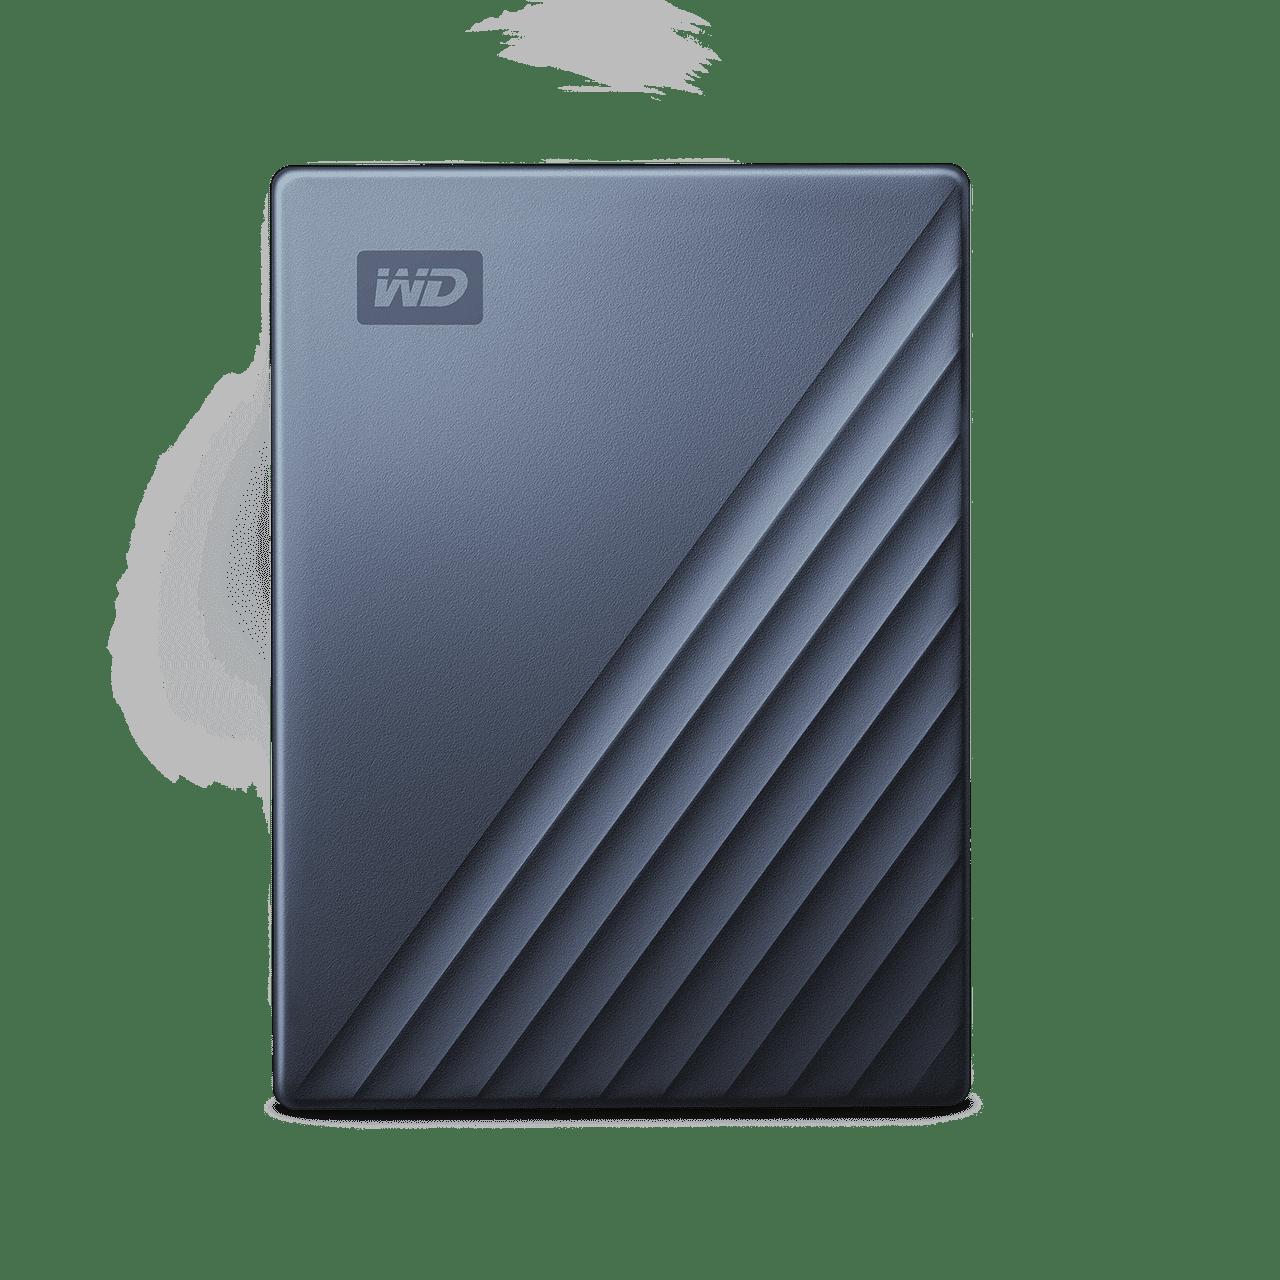 WD My Book WDBBGB0120HBK 12 TB Desktop Hard Drive - External - Black